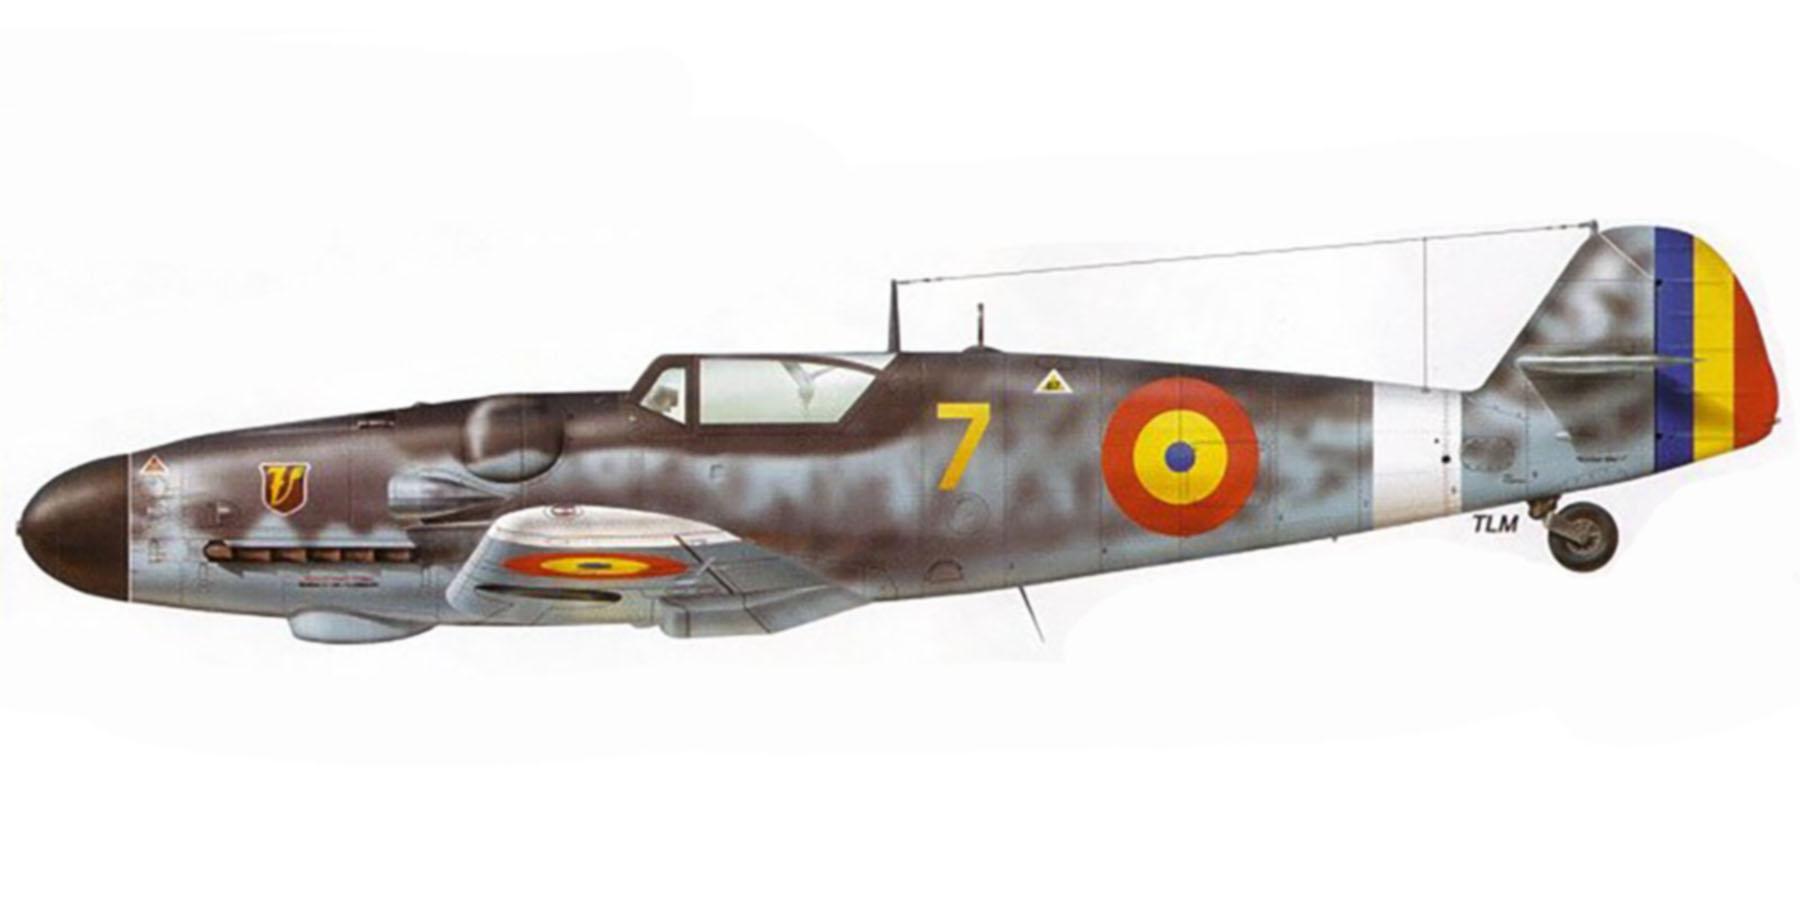 Messerschmitt Bf 109G6 Erla ARR Aeronautica Regala Romana Grupul 7 Yellow 7 Piestany now Slovakia 1945 0A